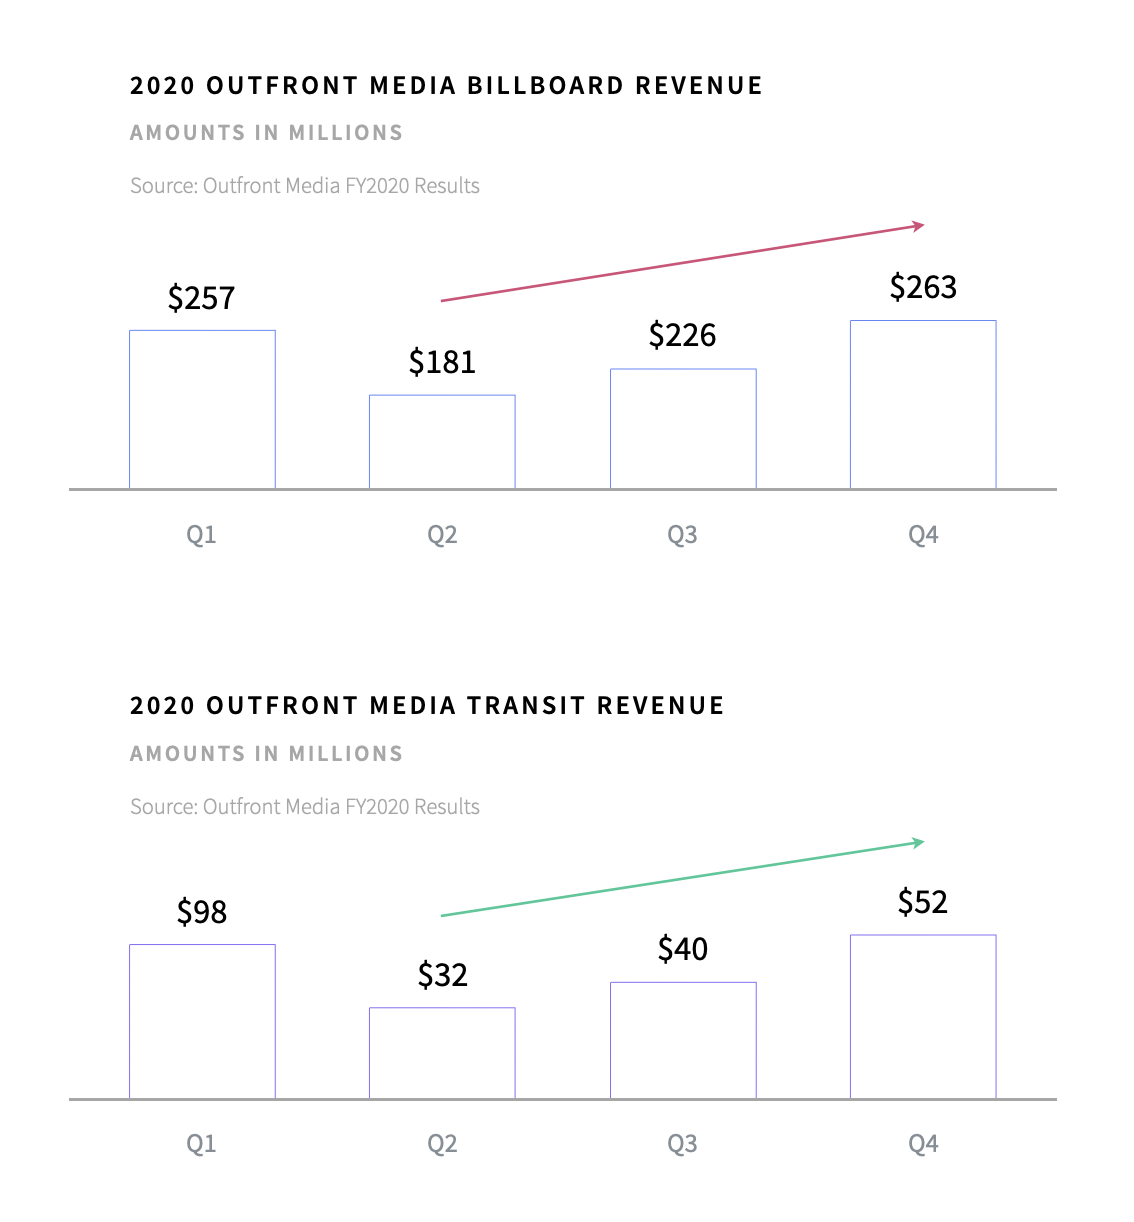 OFM Revenue Billboards vs. Transit Media